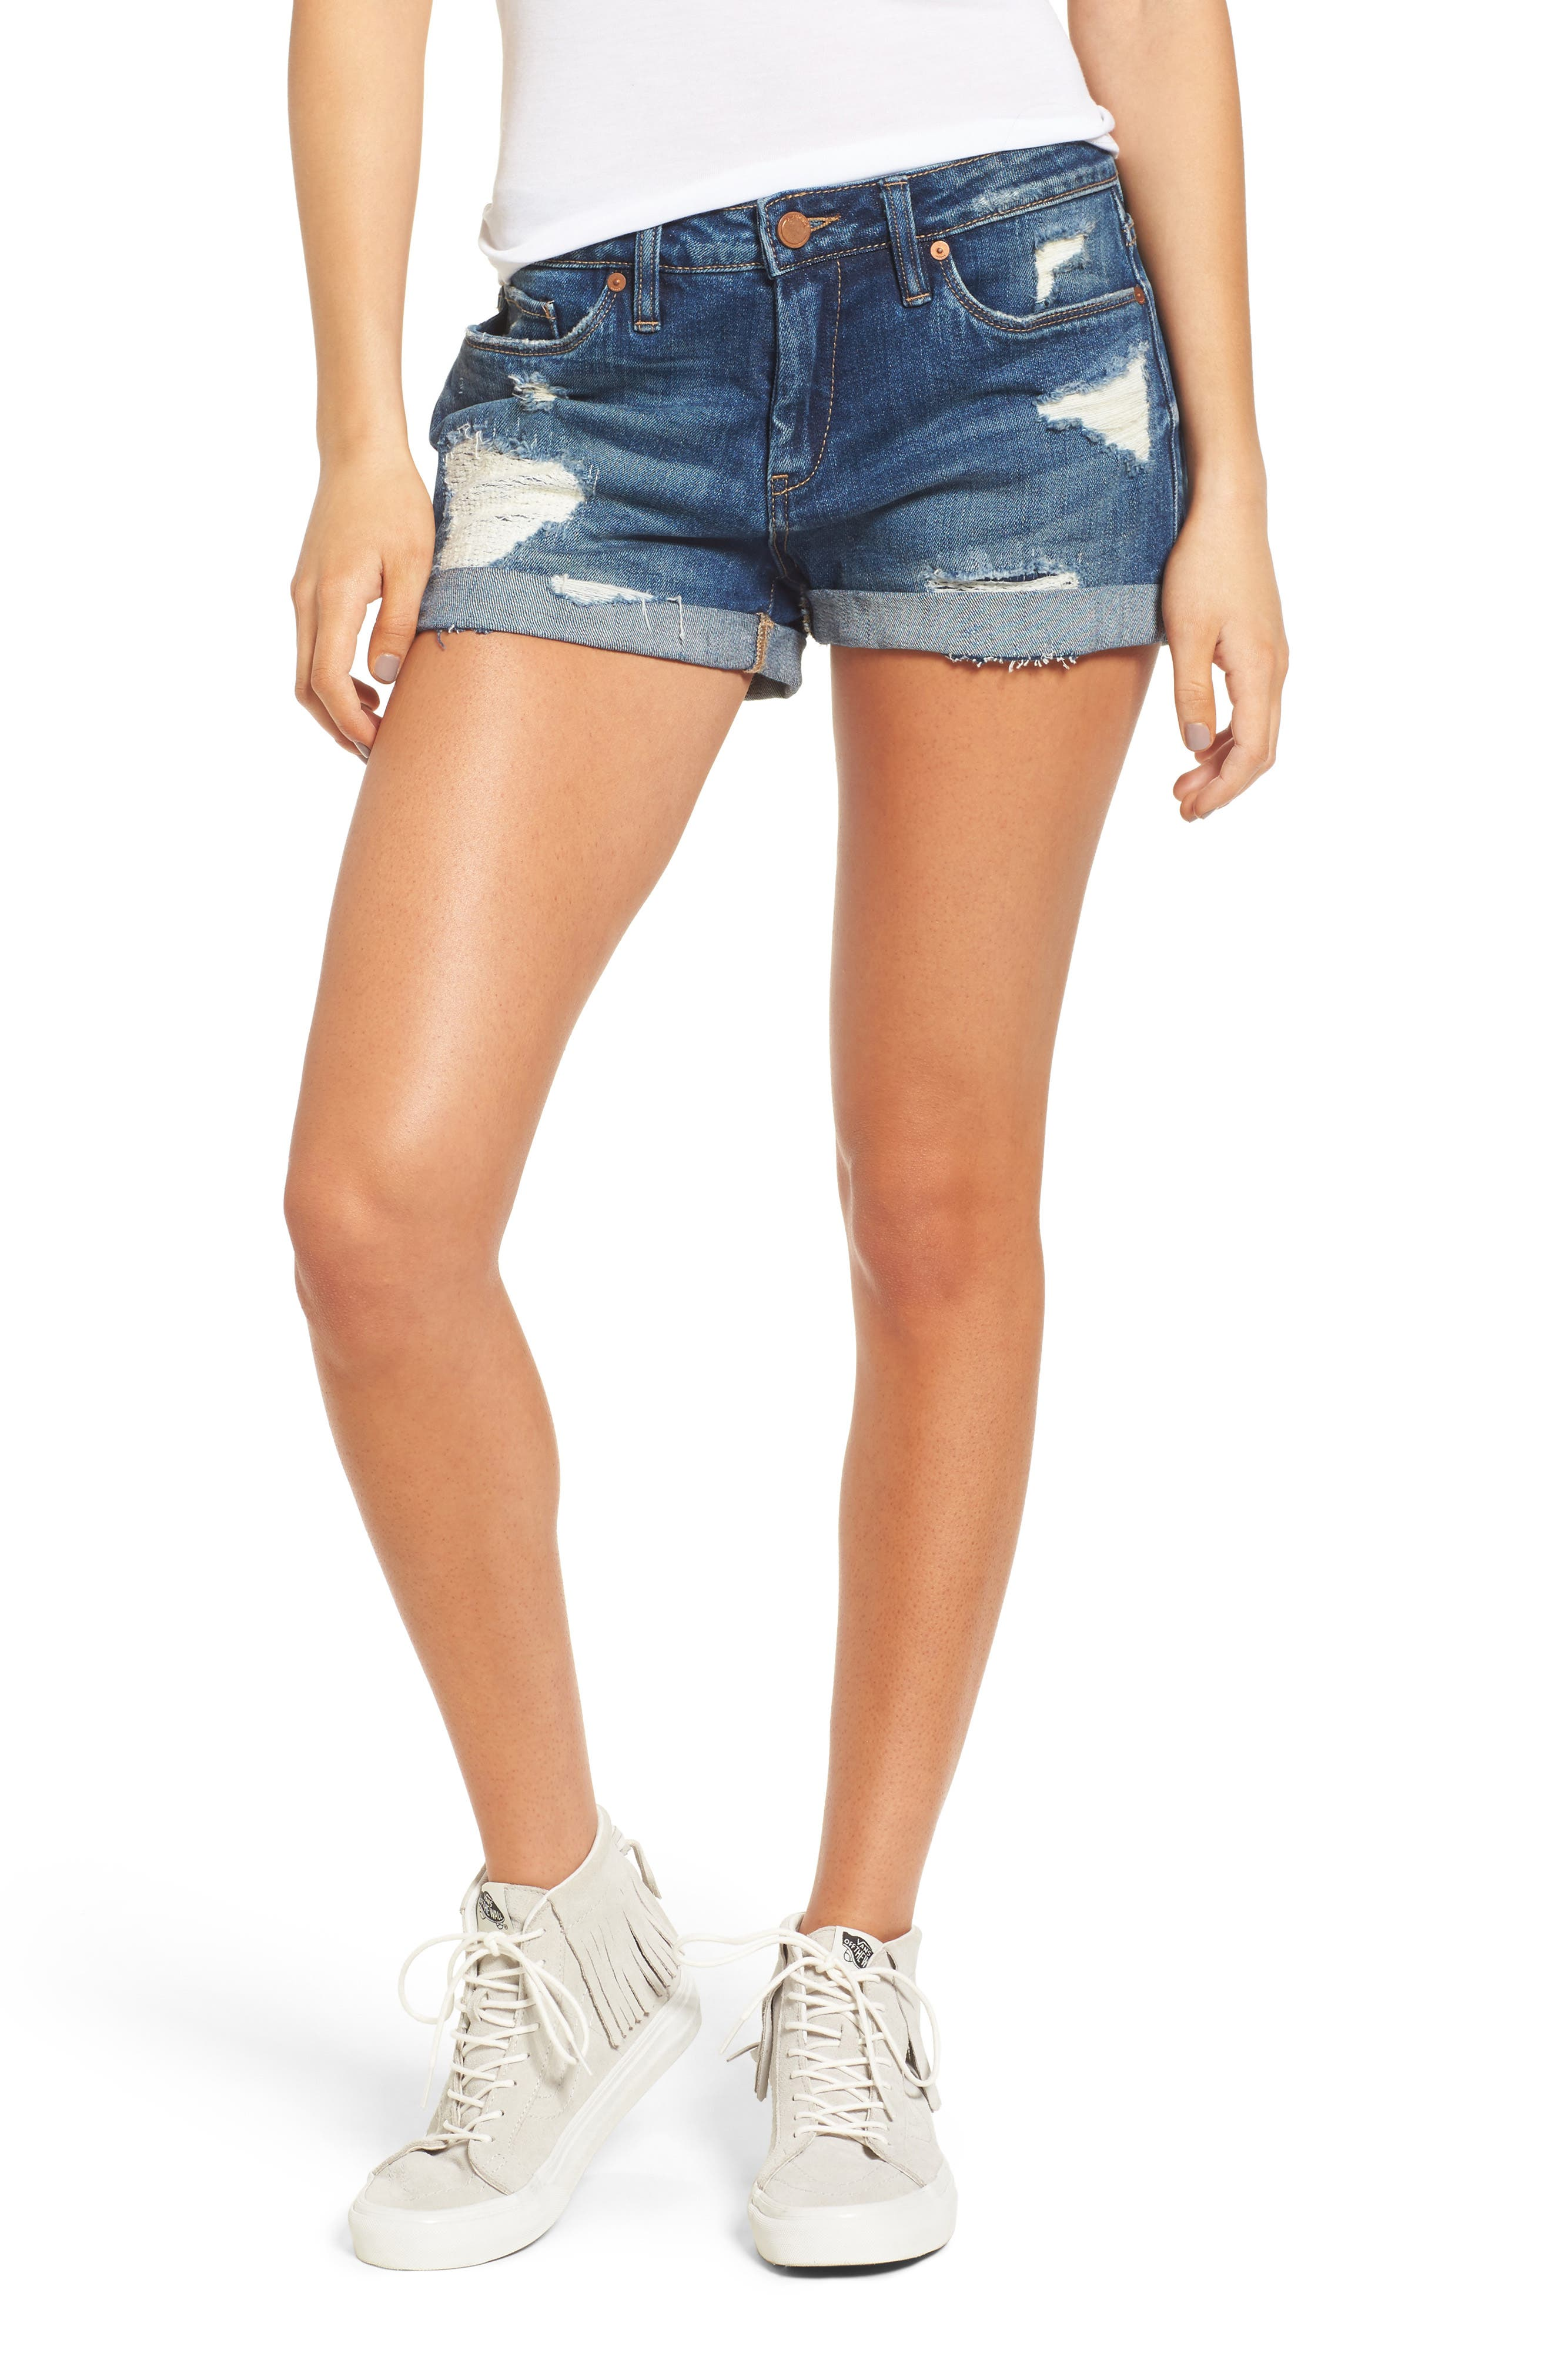 Alternate Image 1 Selected - BLANKNYC Boyfriend Denim Shorts (Dress Down Party)